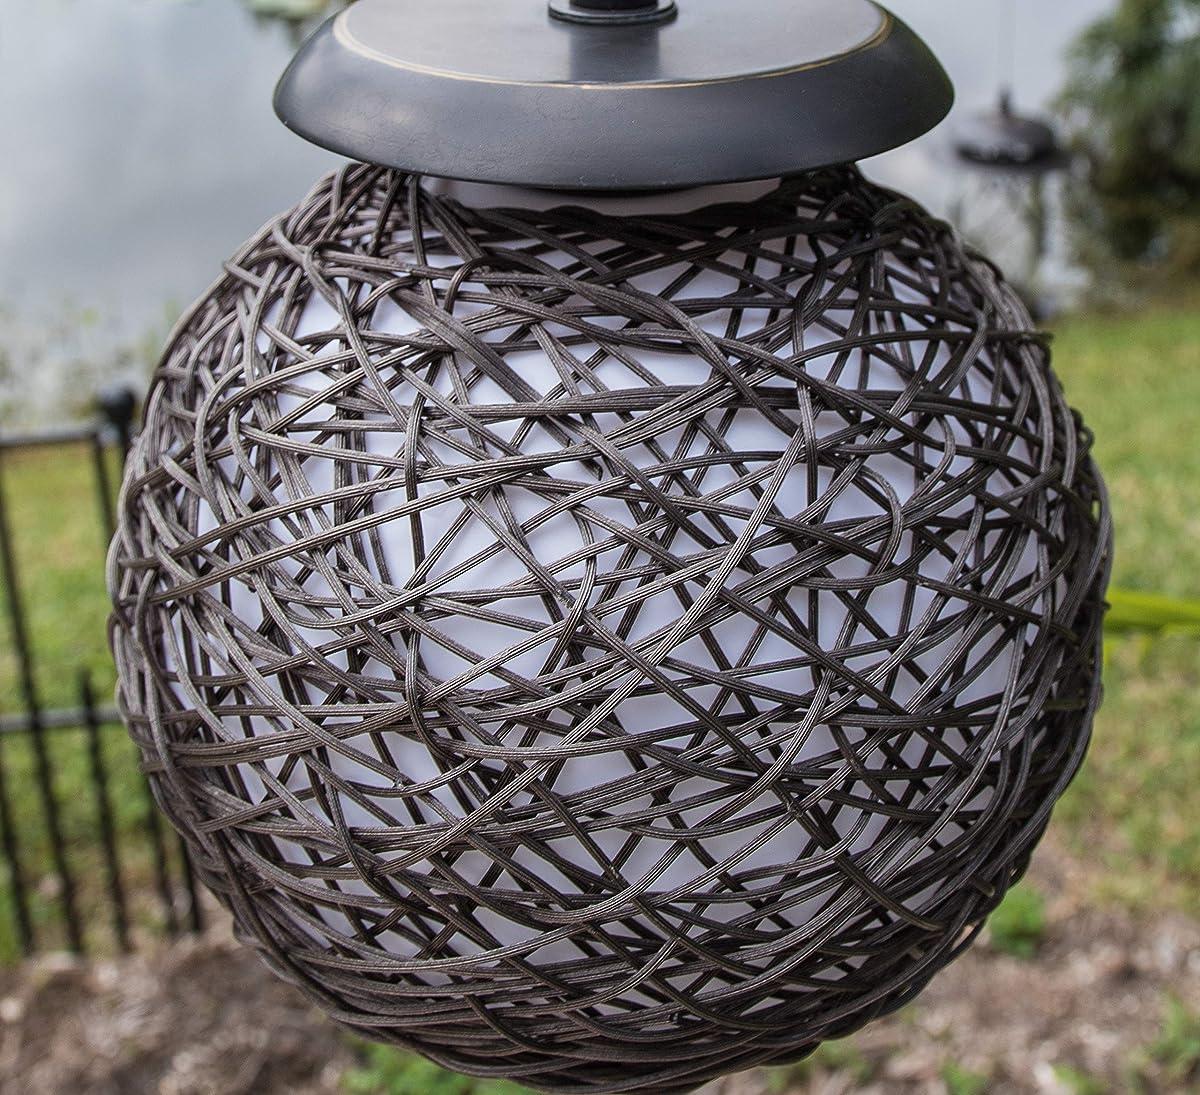 Kenroy Home 32246BRZ Castillo Outdoor Floor Lamp, Bronze Finish